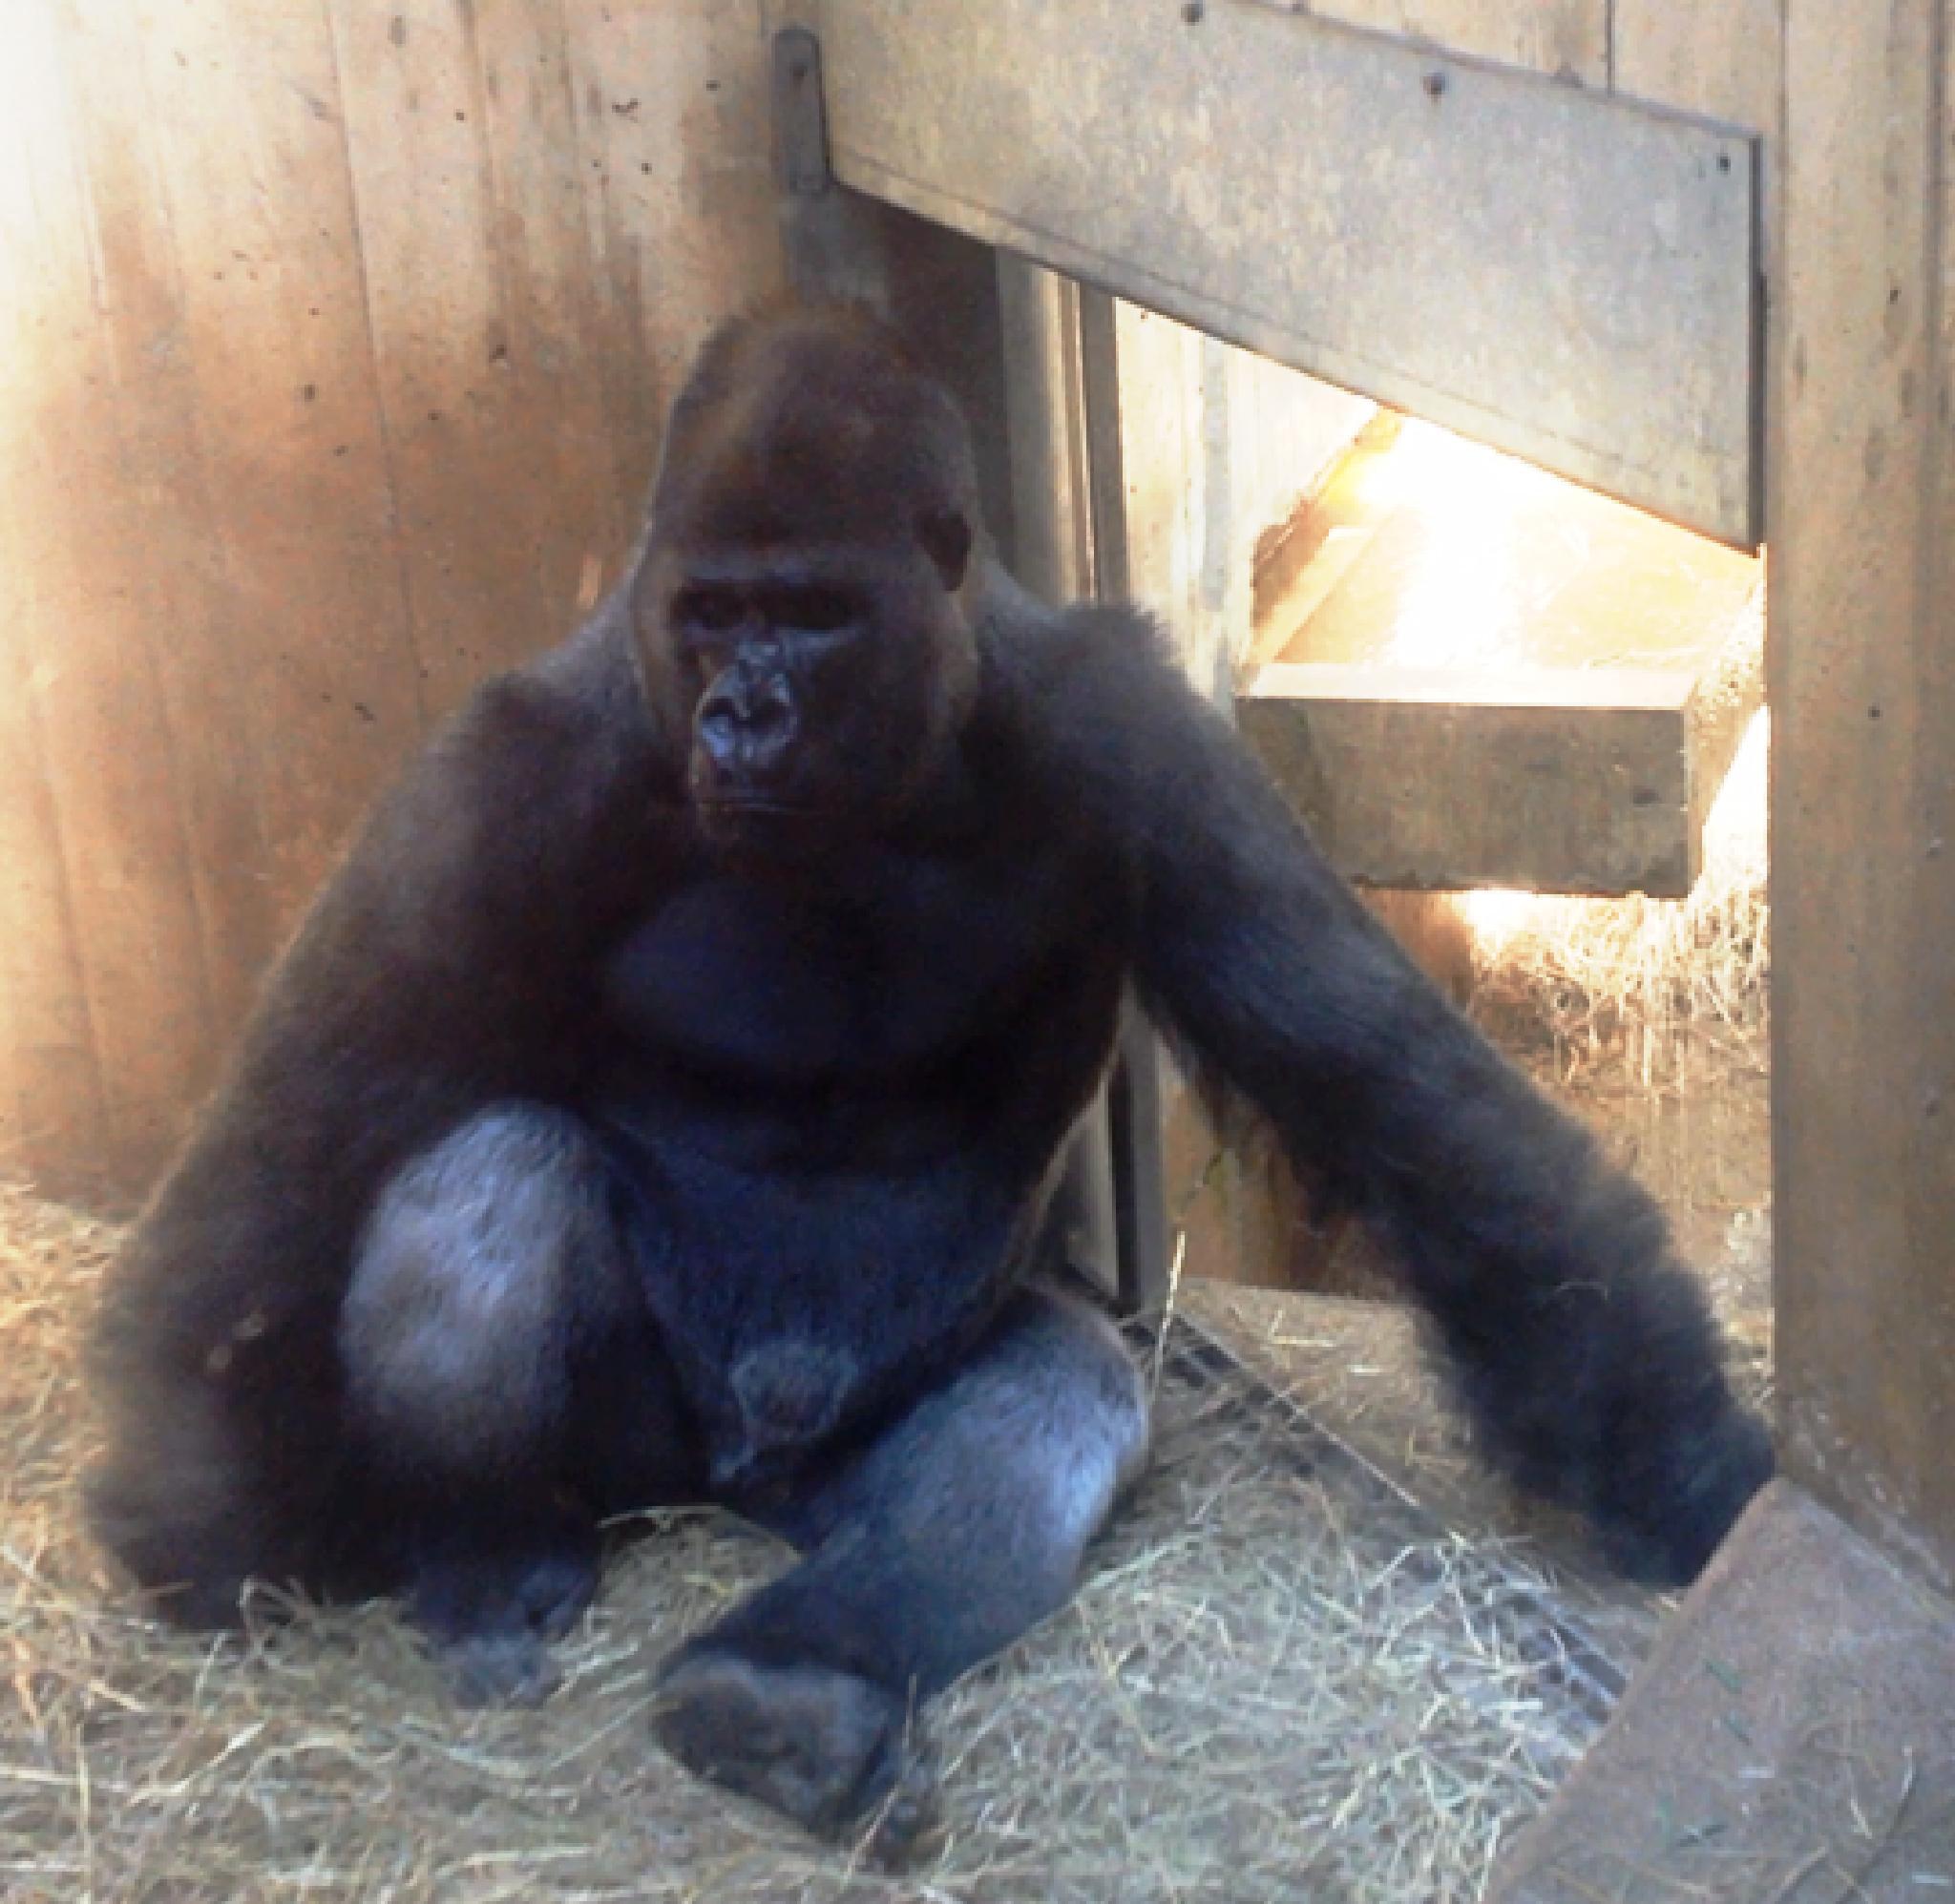 Gorilla by PVGD